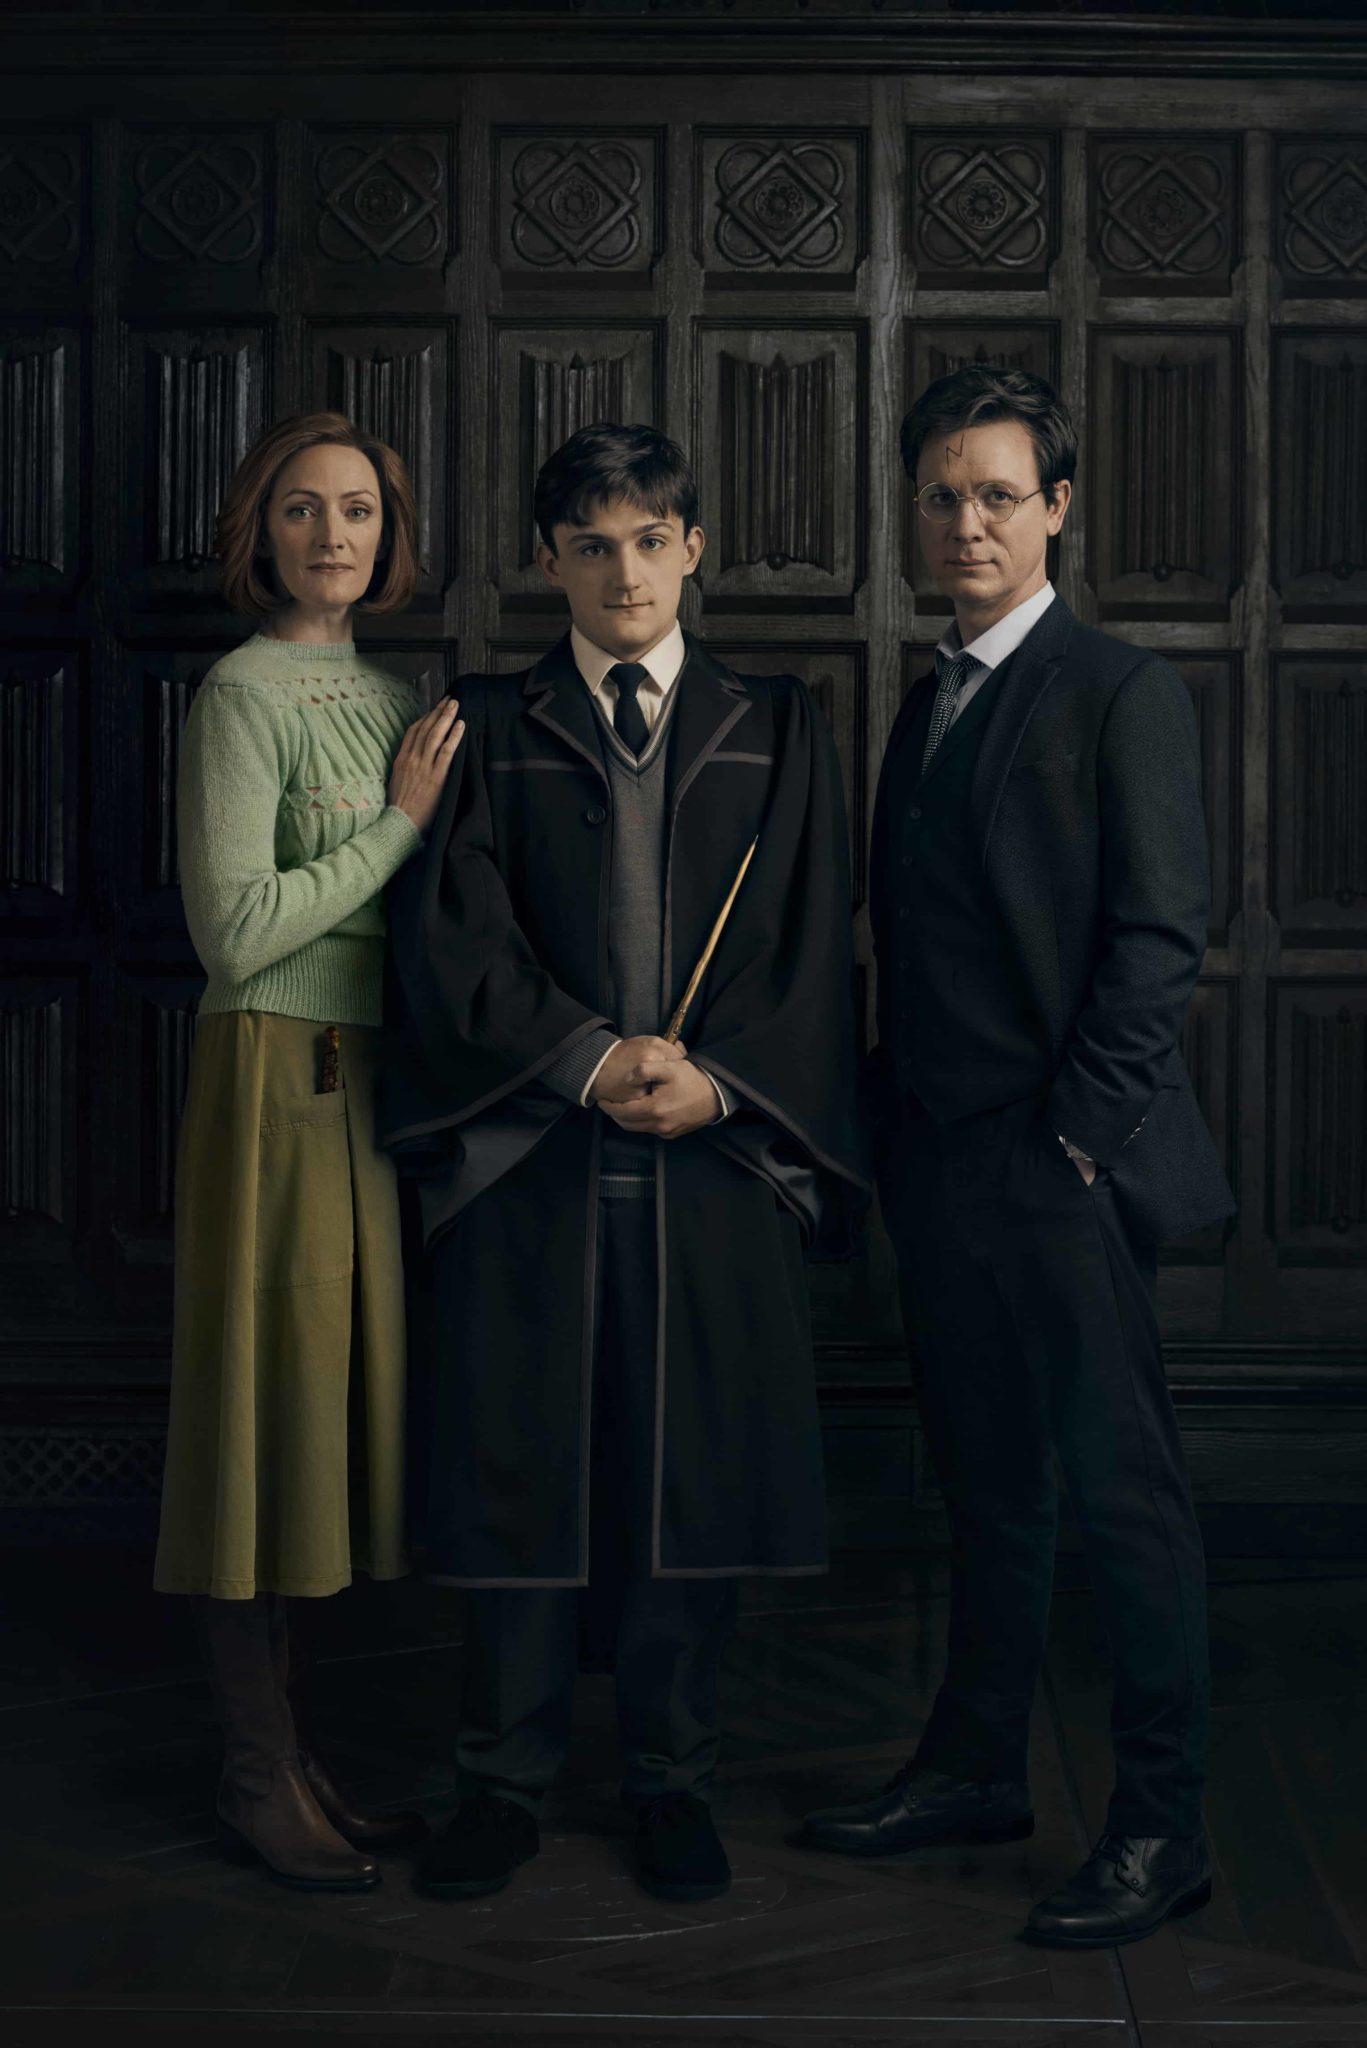 Gina (Susie Trayling), Alvo Severo (Joe Idris-Roberts) e Harry Potter (Jamie Ballard) em Cursed Child